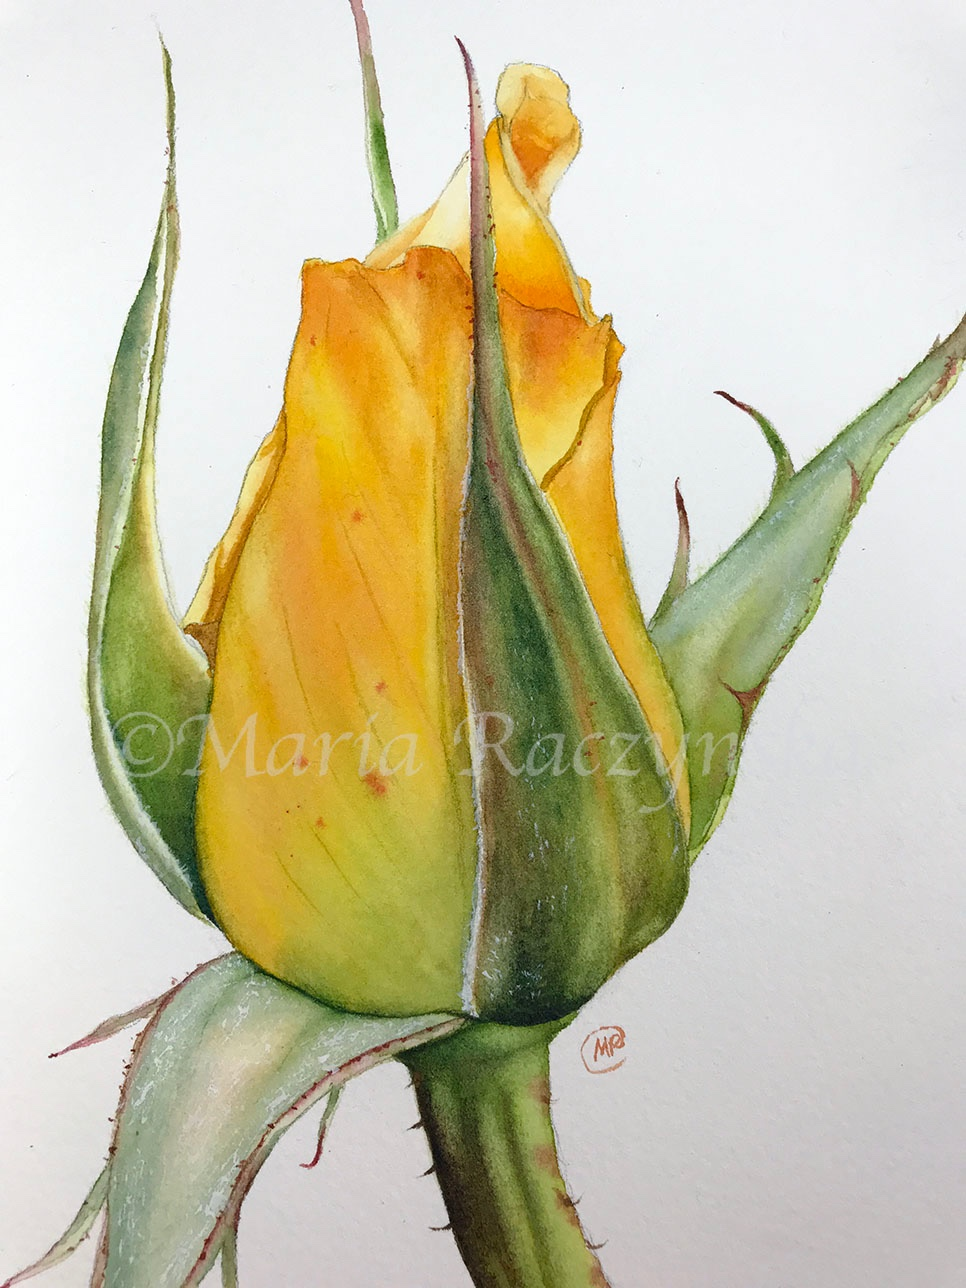 Watercolor Rose Maria Raczynska Watercolors